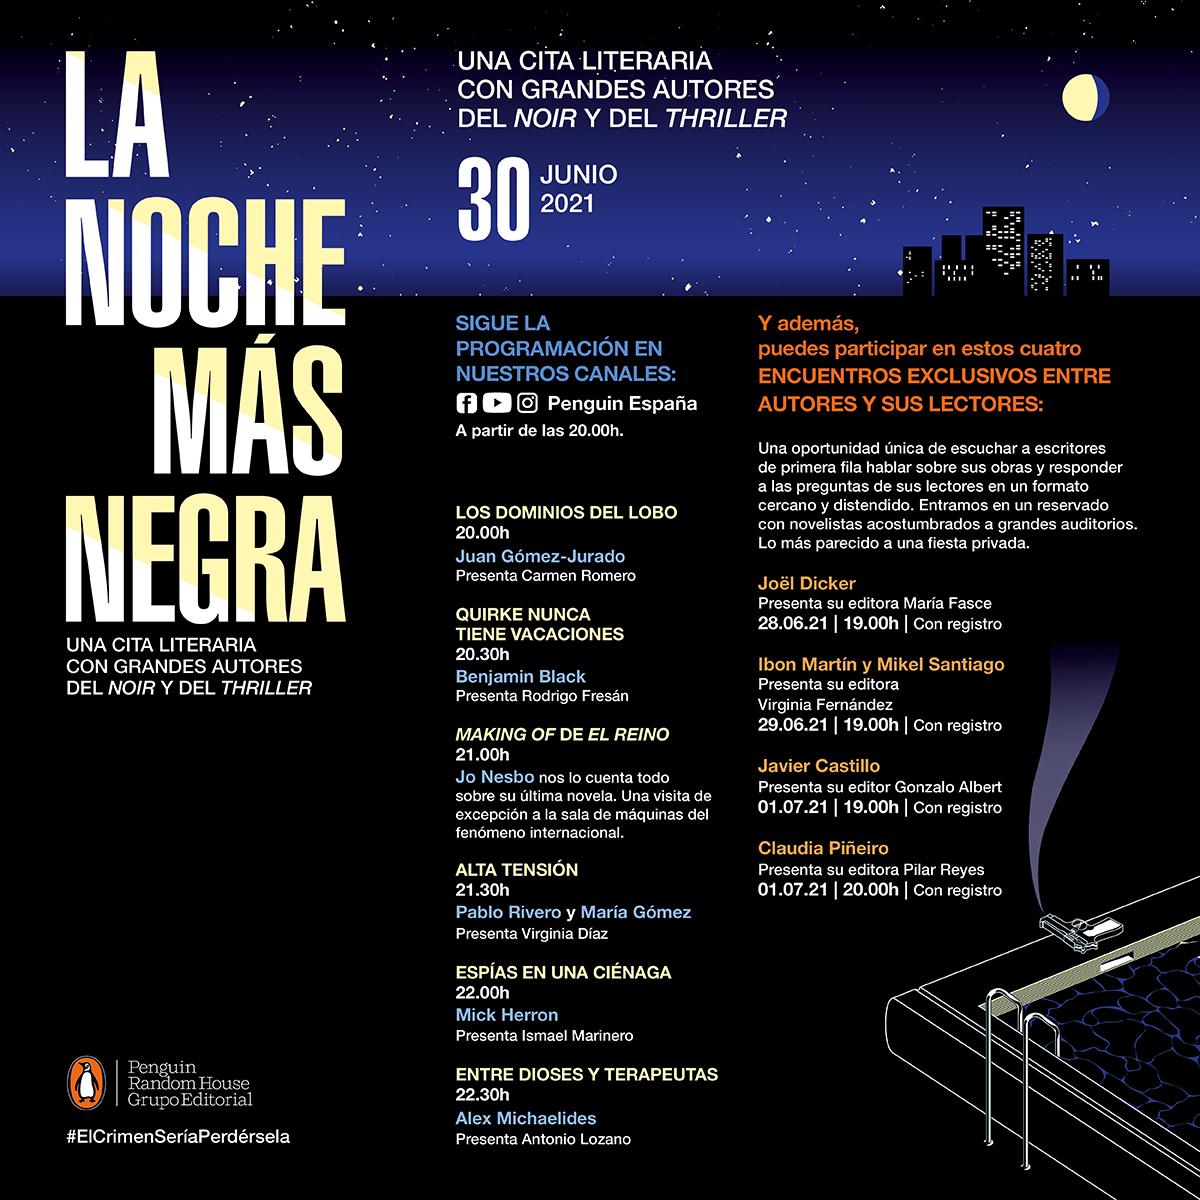 Penguin Random House celebra La Noche Más Negra